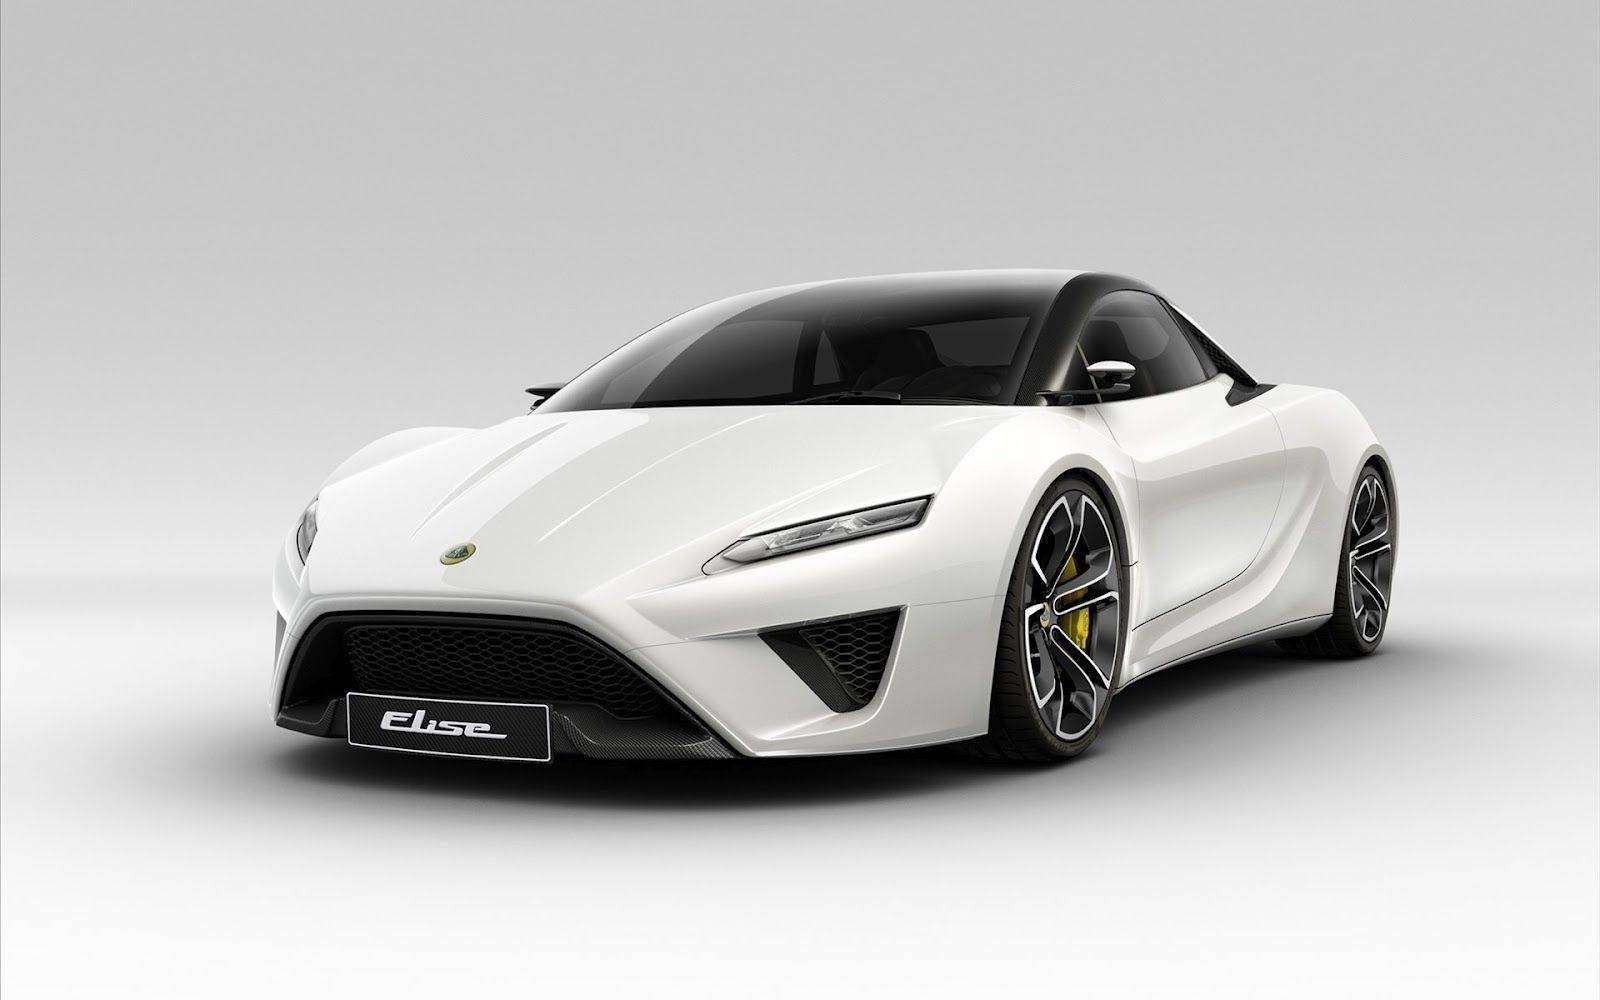 2019 Lotus Esprit Price And Release Date Car 2018 2019